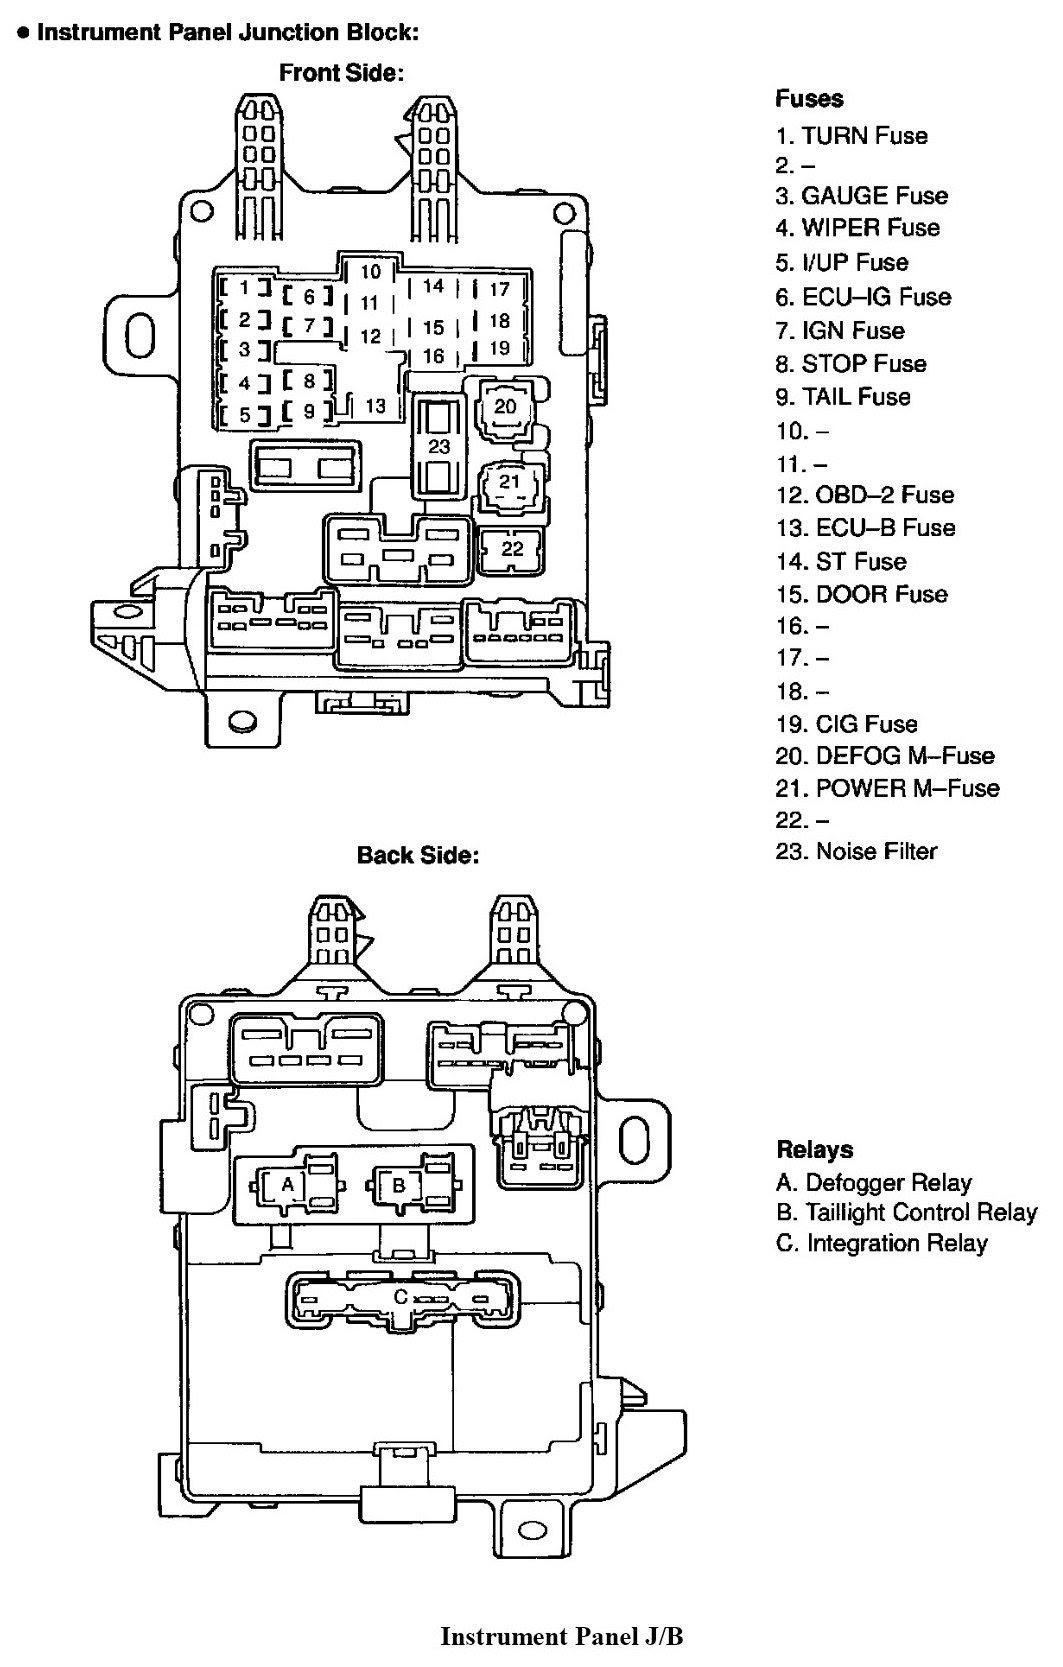 2003 Corolla Fuse Box Diagram Wiring Diagram United3 United3 Maceratadoc It